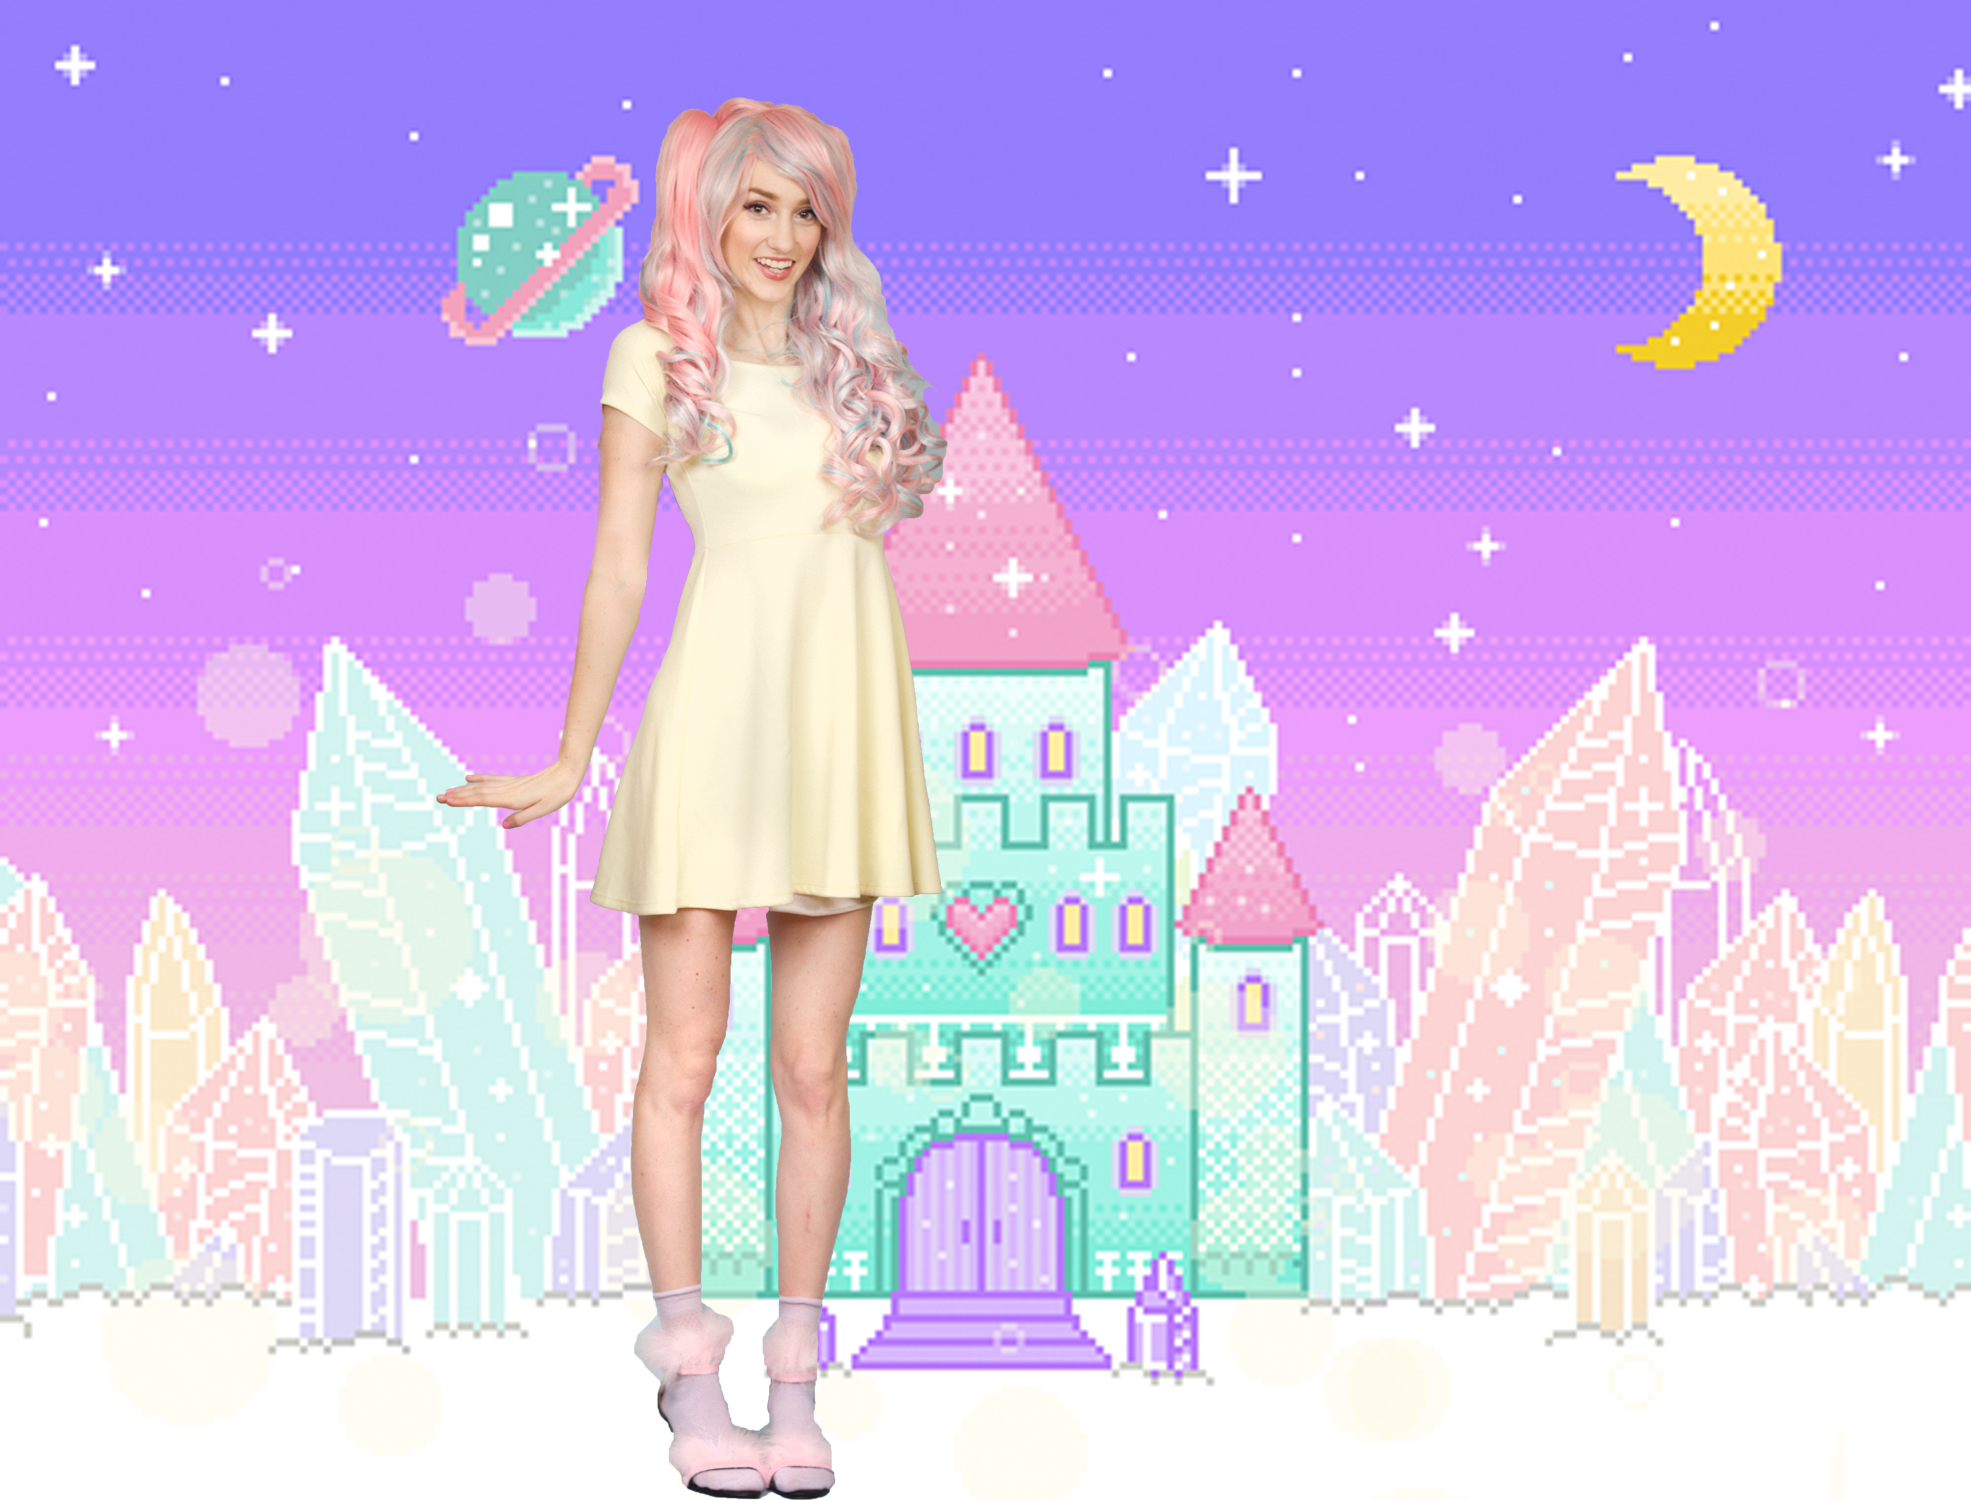 princessgoombaspace2.jpg